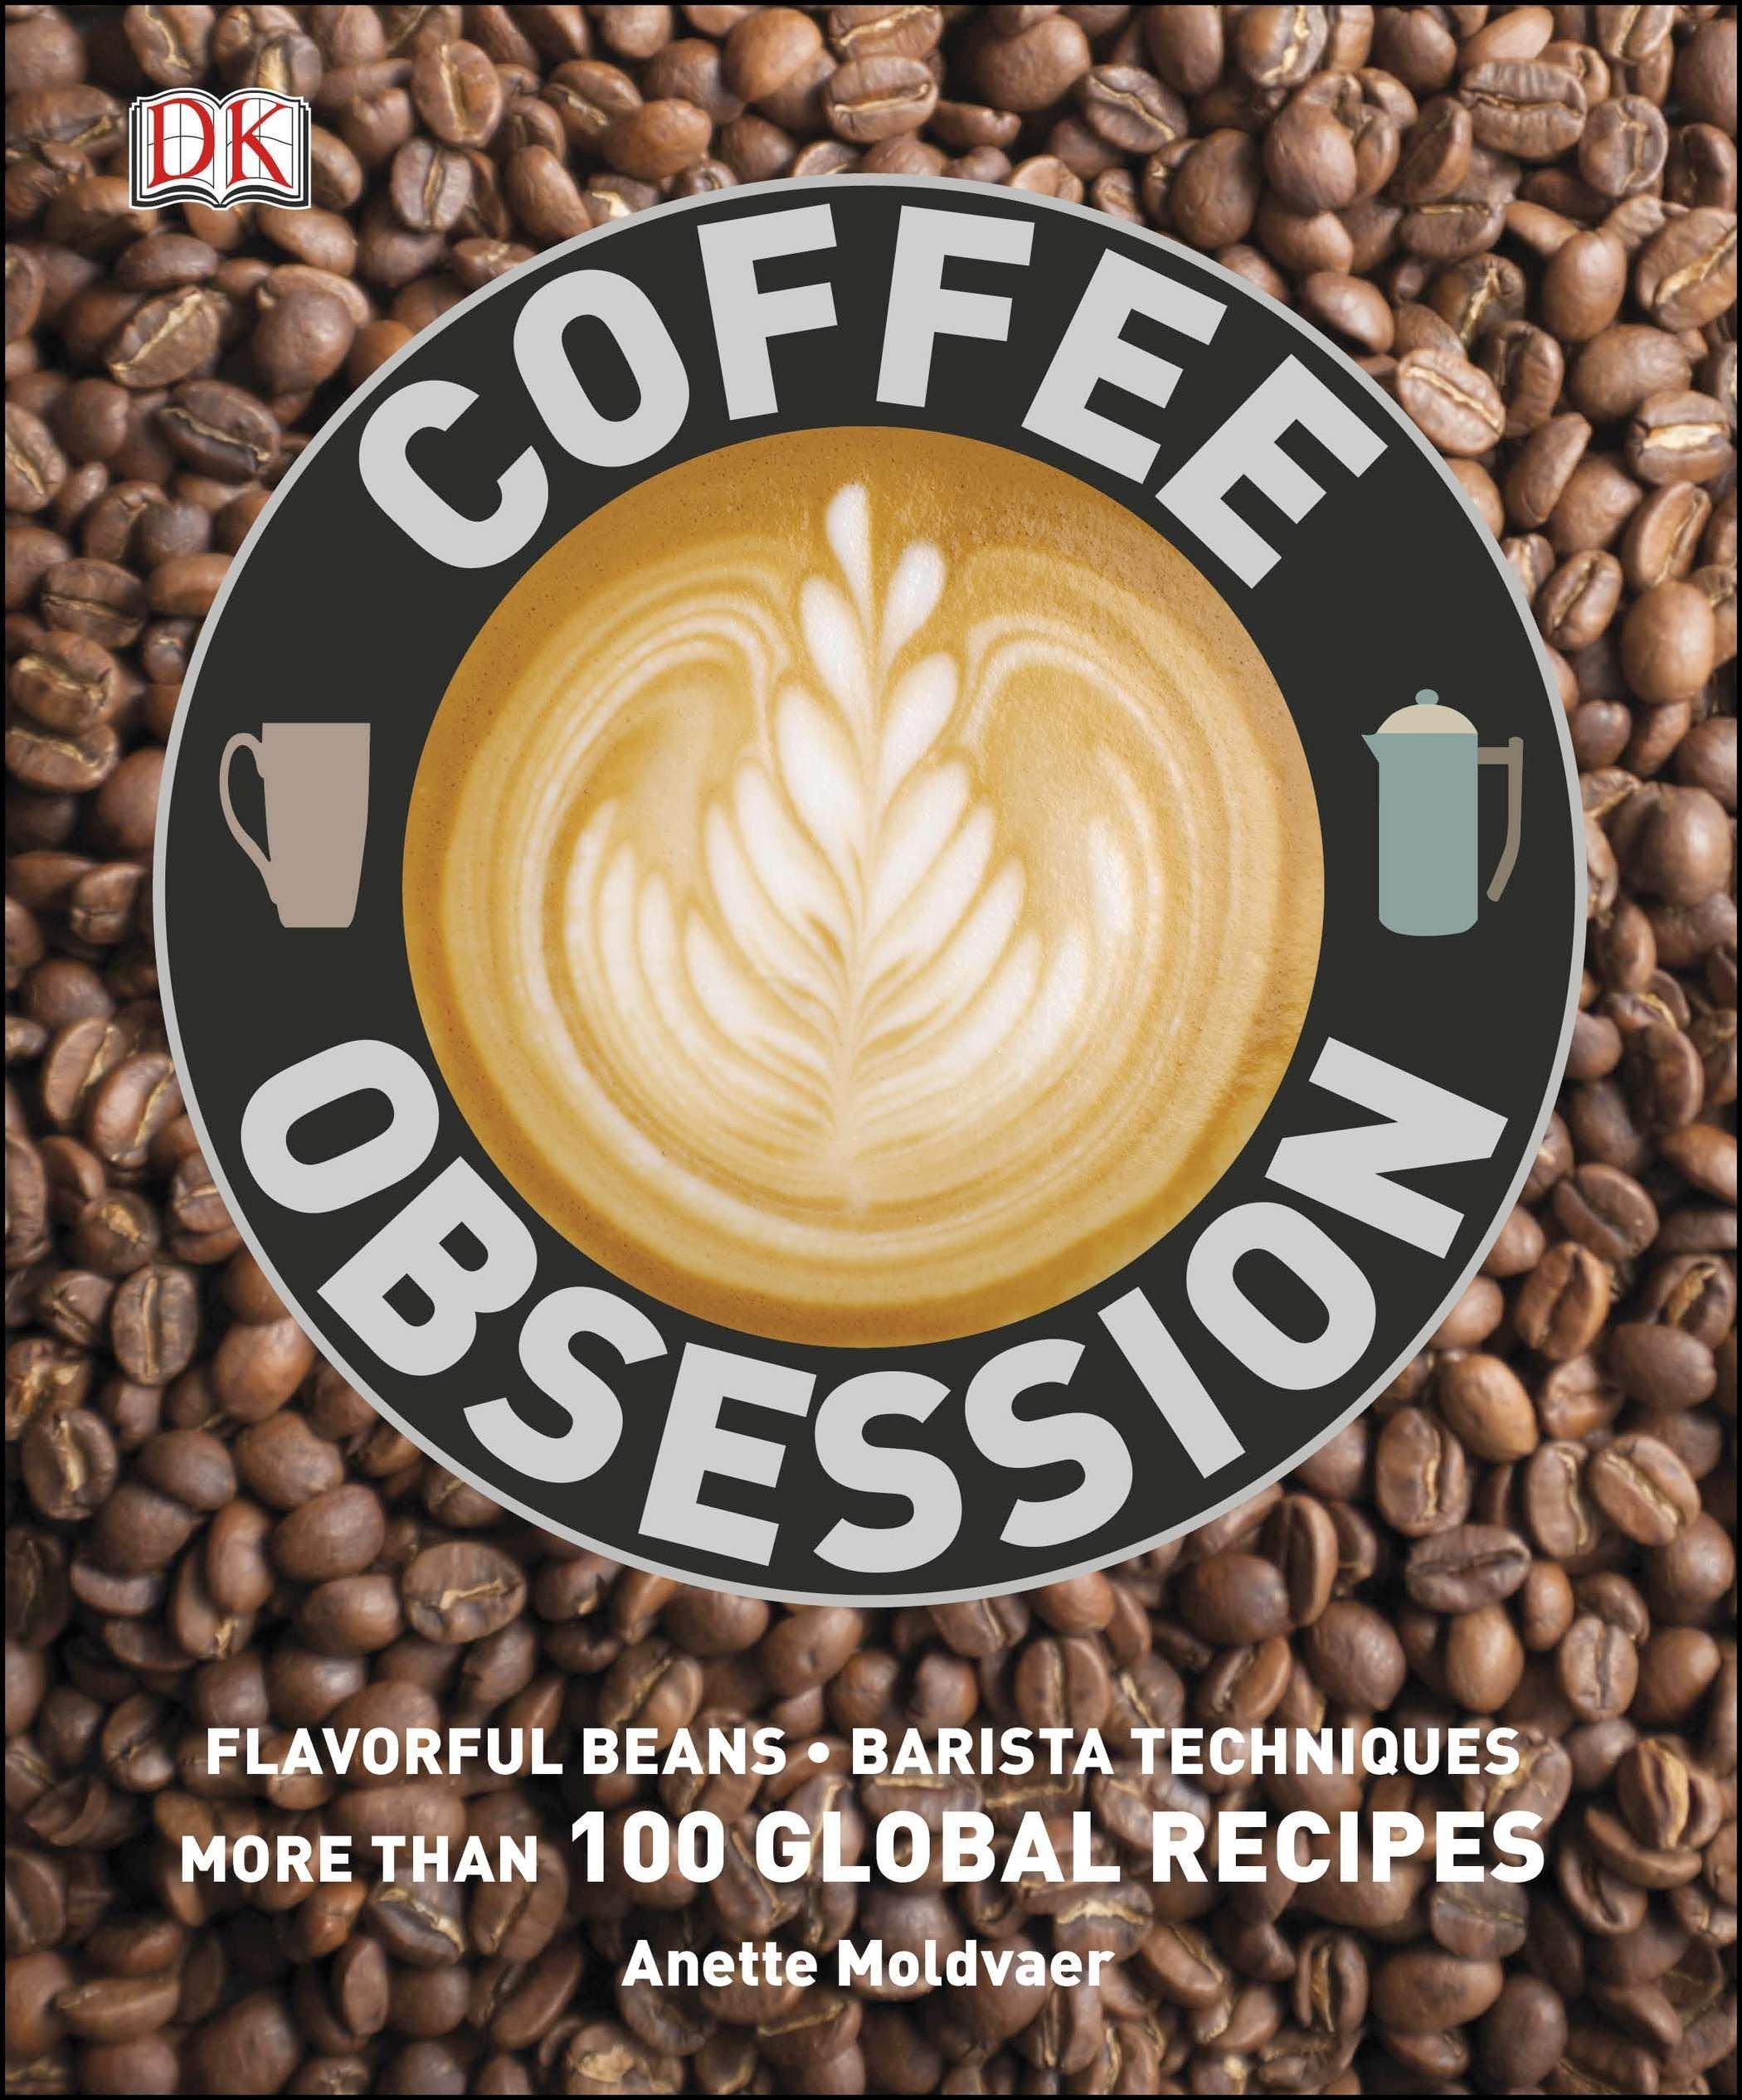 Coffee Obsession DK